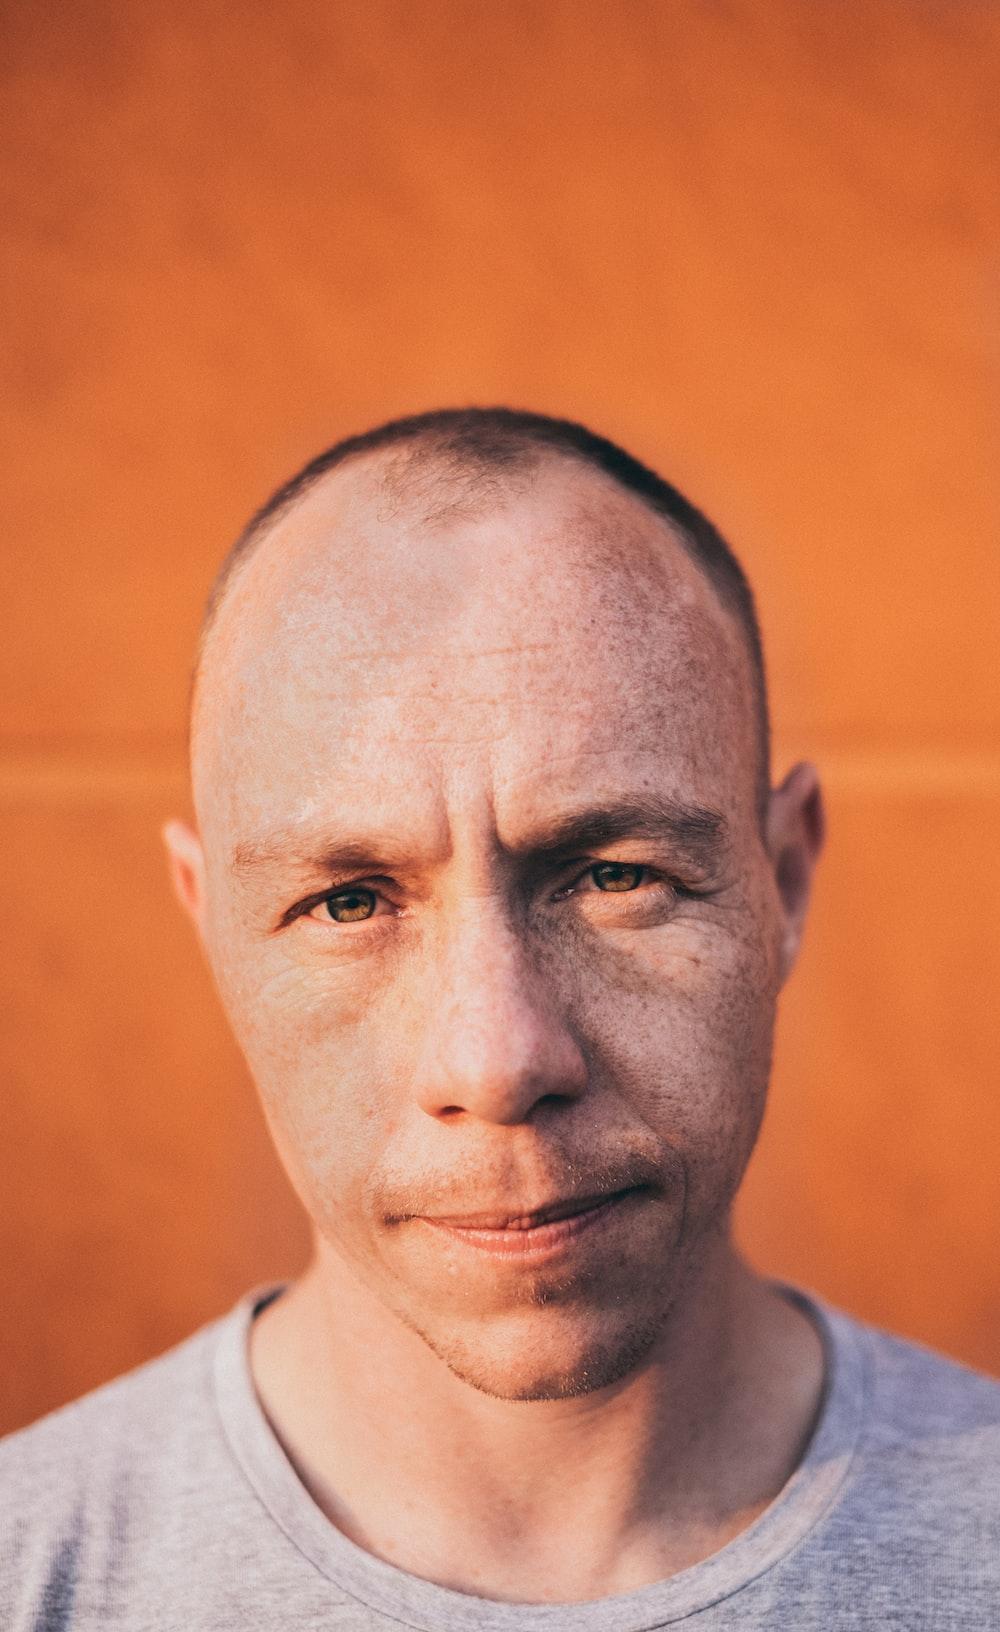 portrait of man wearing gray crew-neck shirt